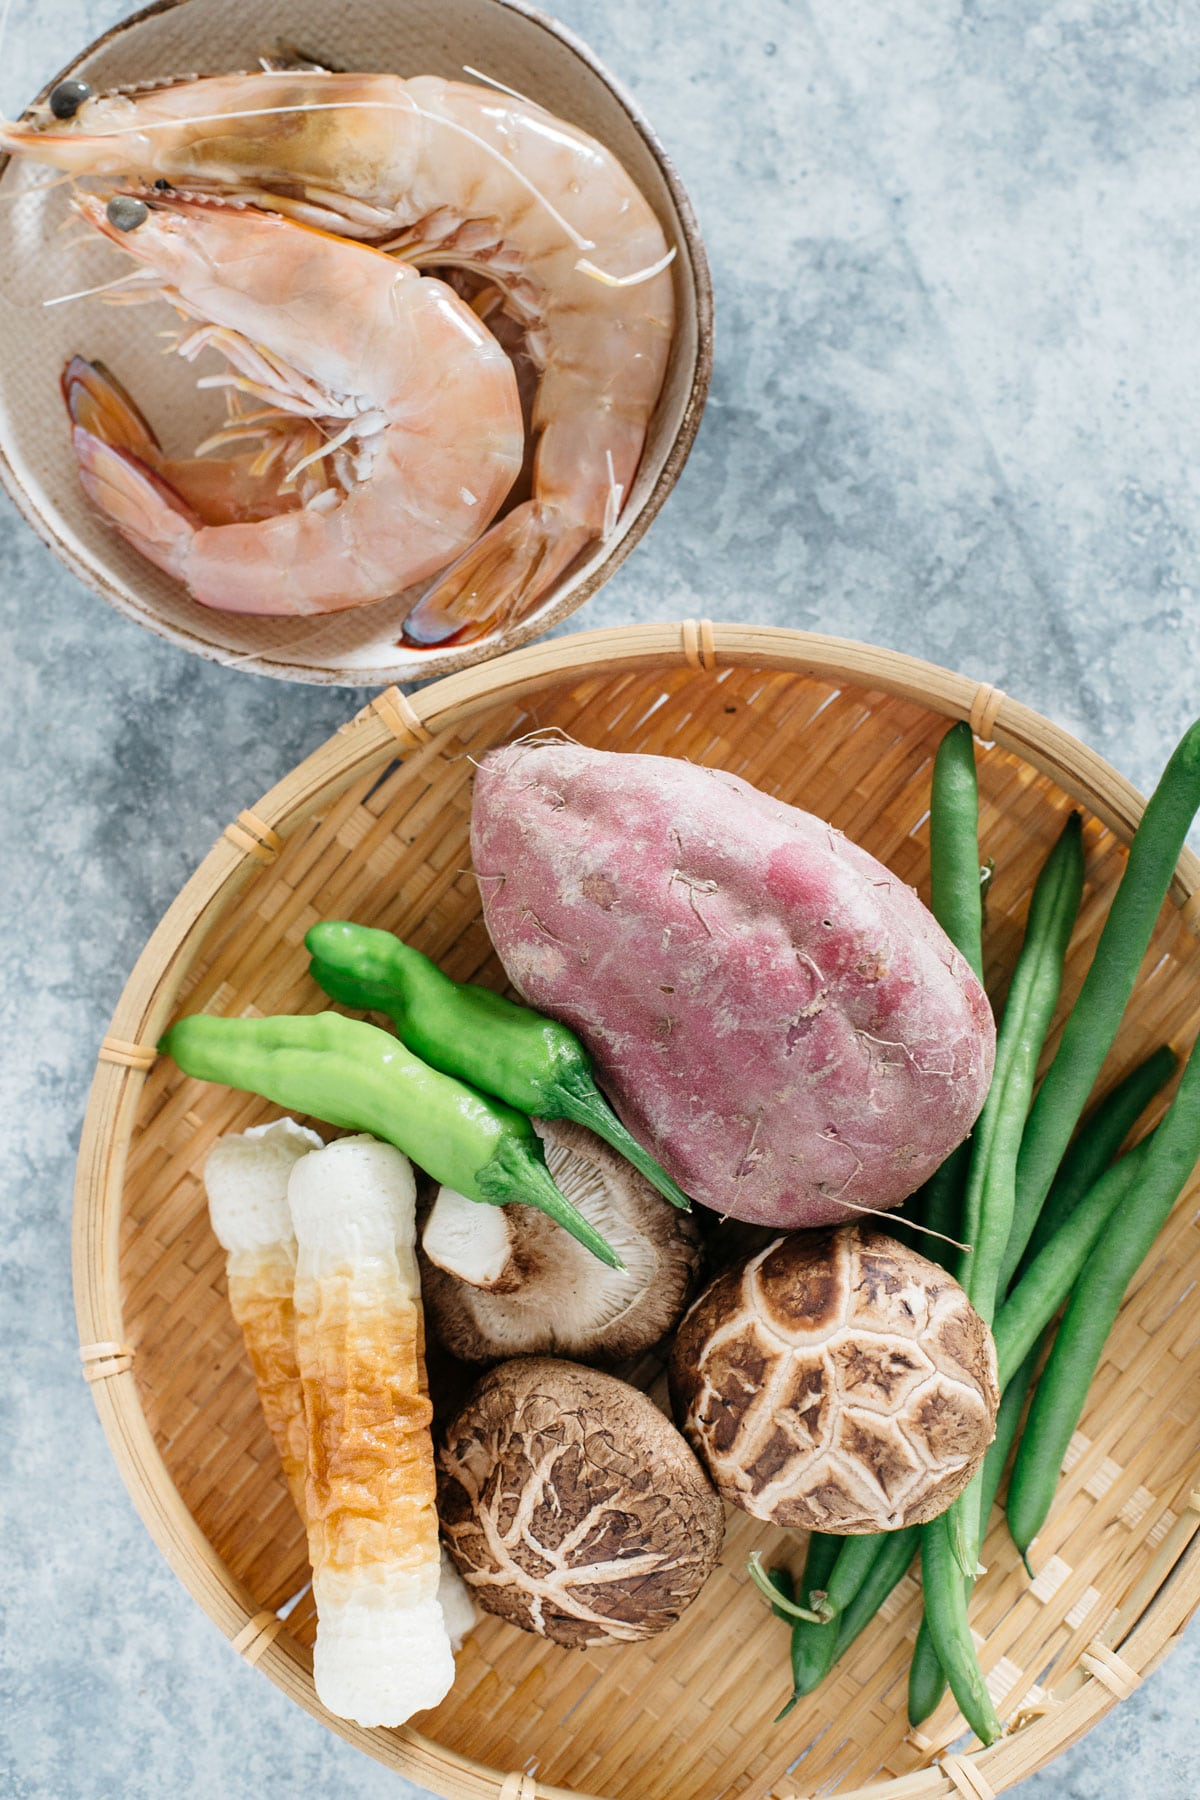 Tempura Donburi ingredients-prawns, fish cake Chikuwa, shiitake mushrooms, purple sweet potato, shishito, green beans.